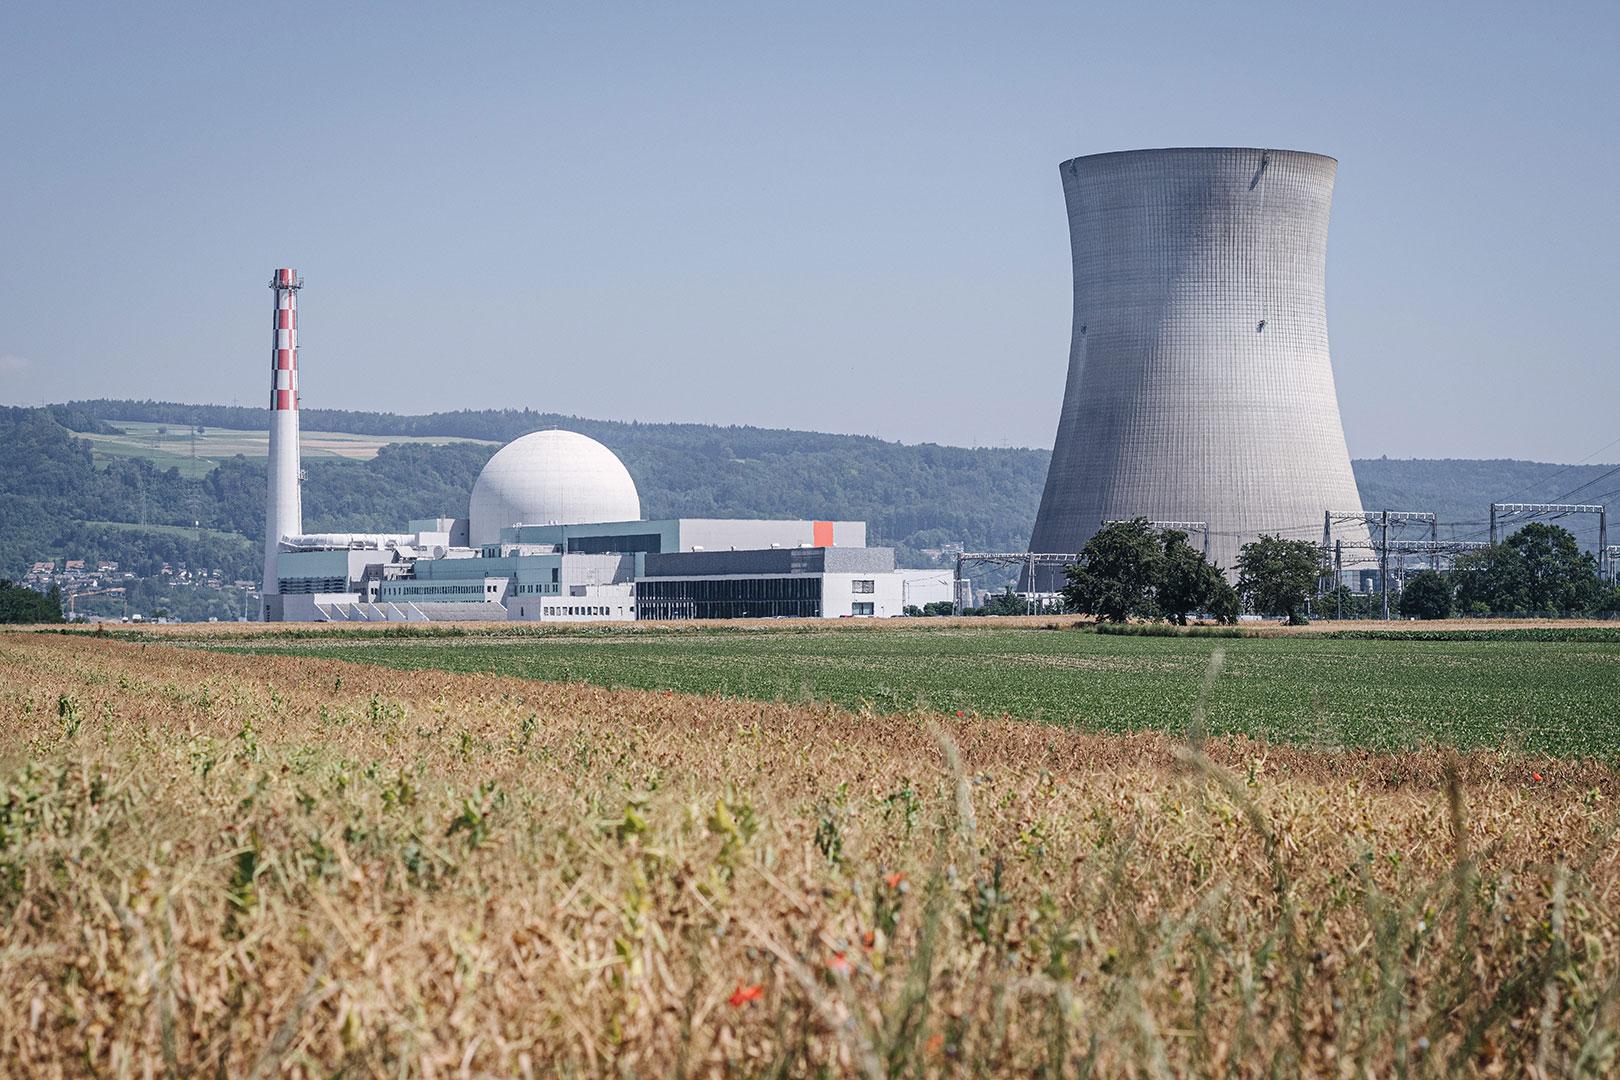 Kernkraftwerk bei Leibstadt